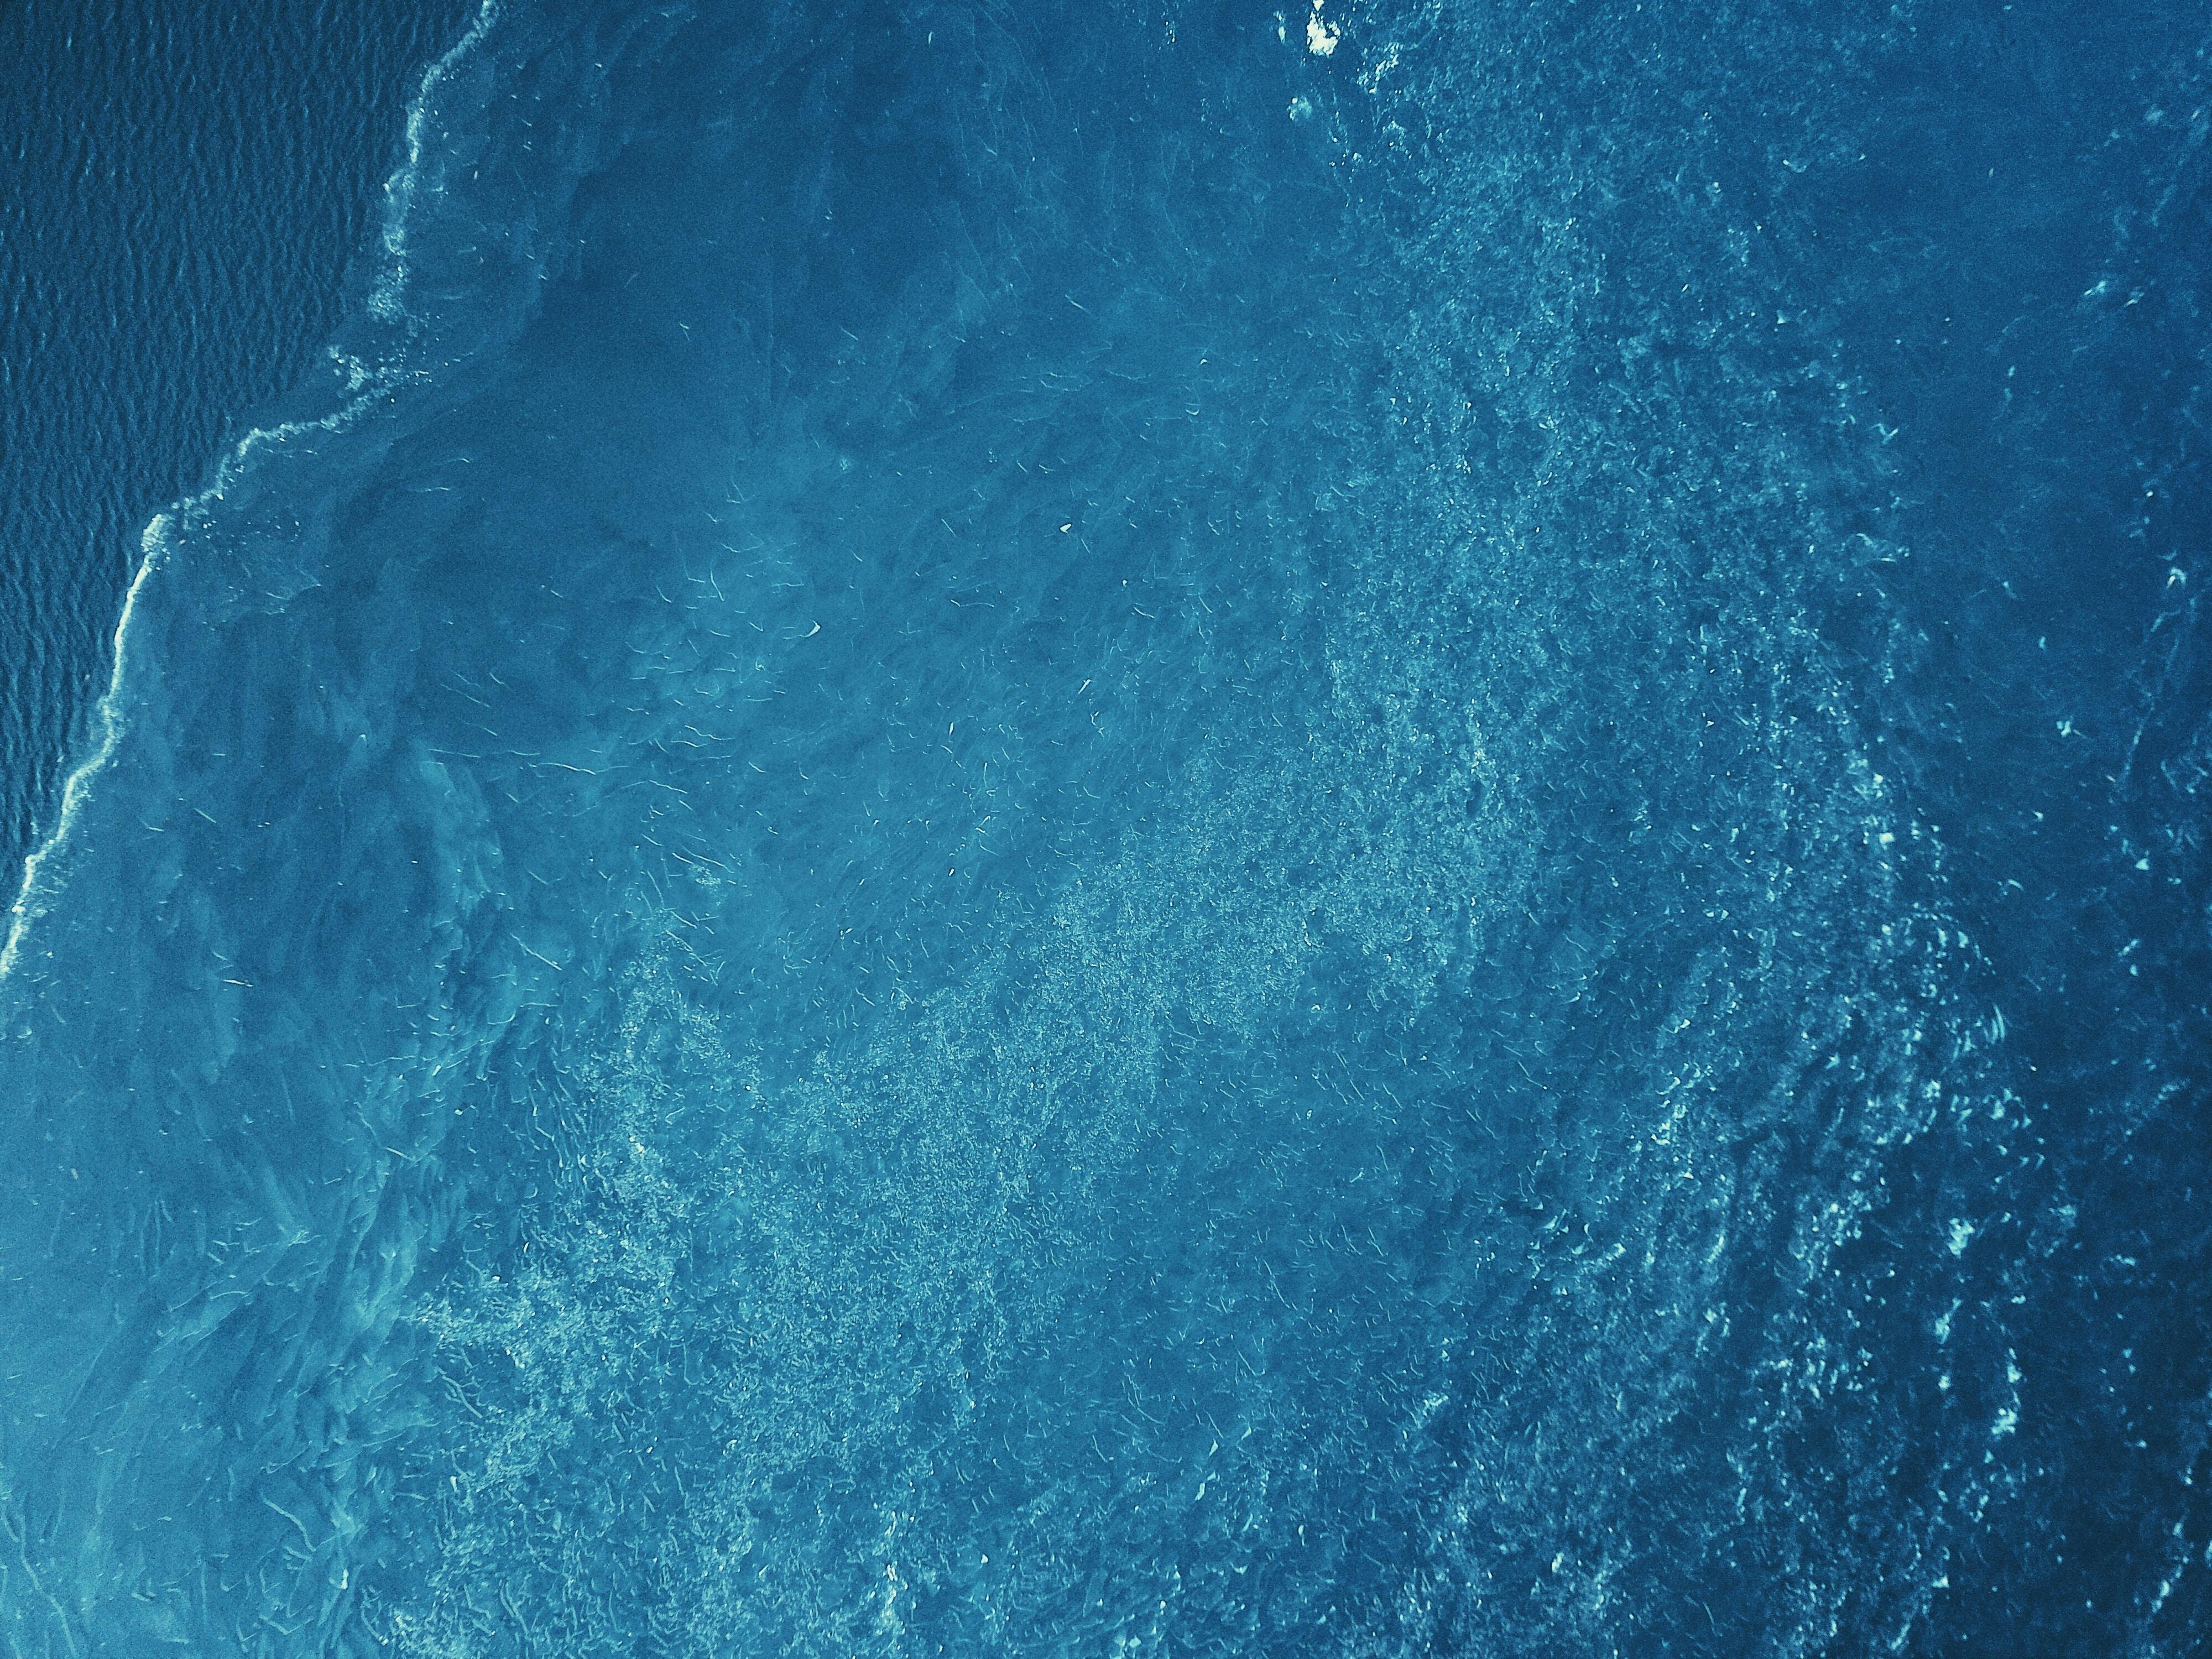 bird's-eye view of body of water